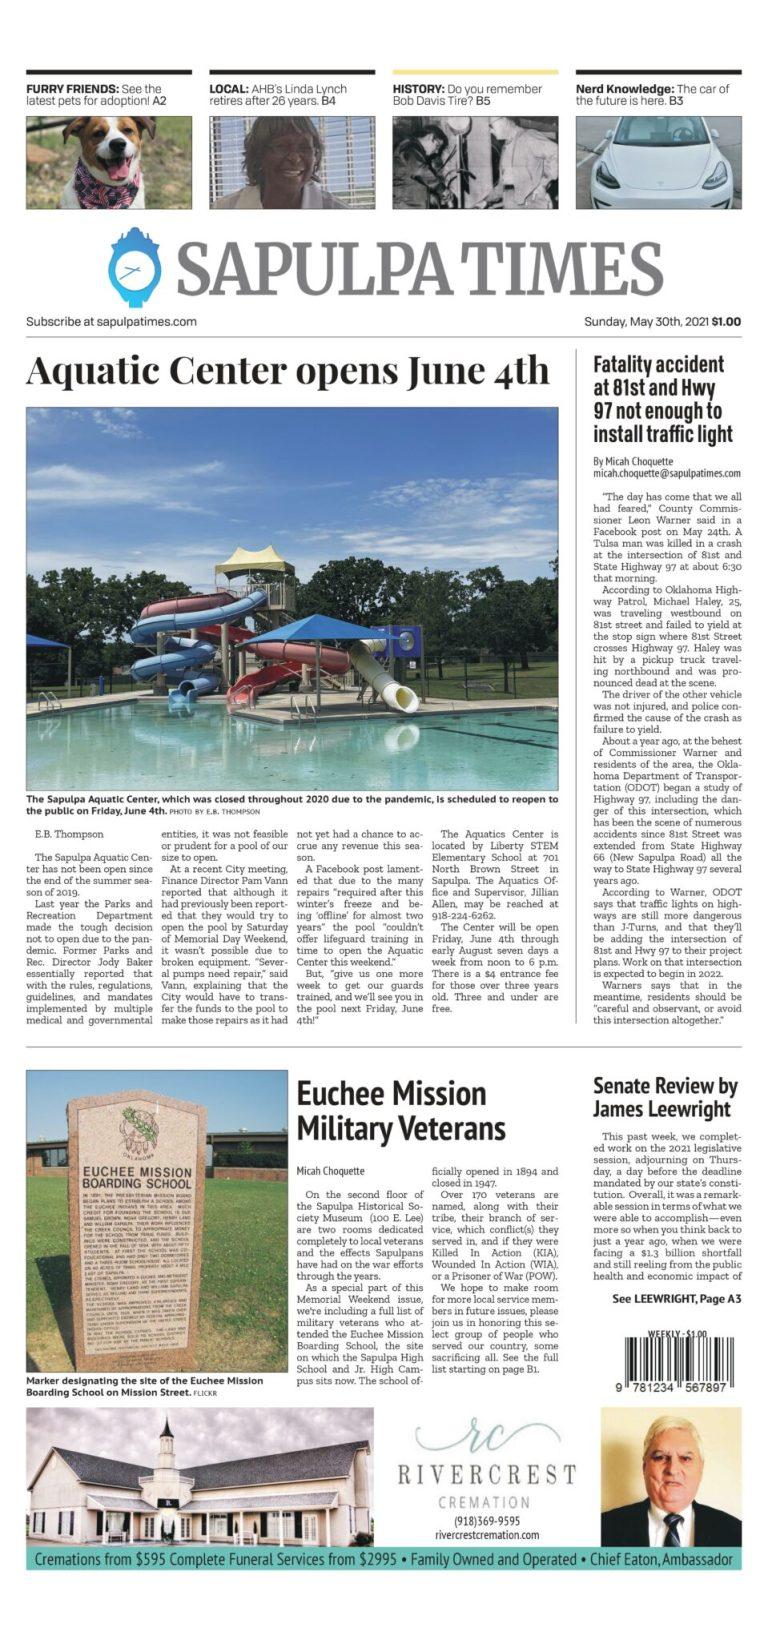 Sapulpa Times Digital Edition 05/30/2021